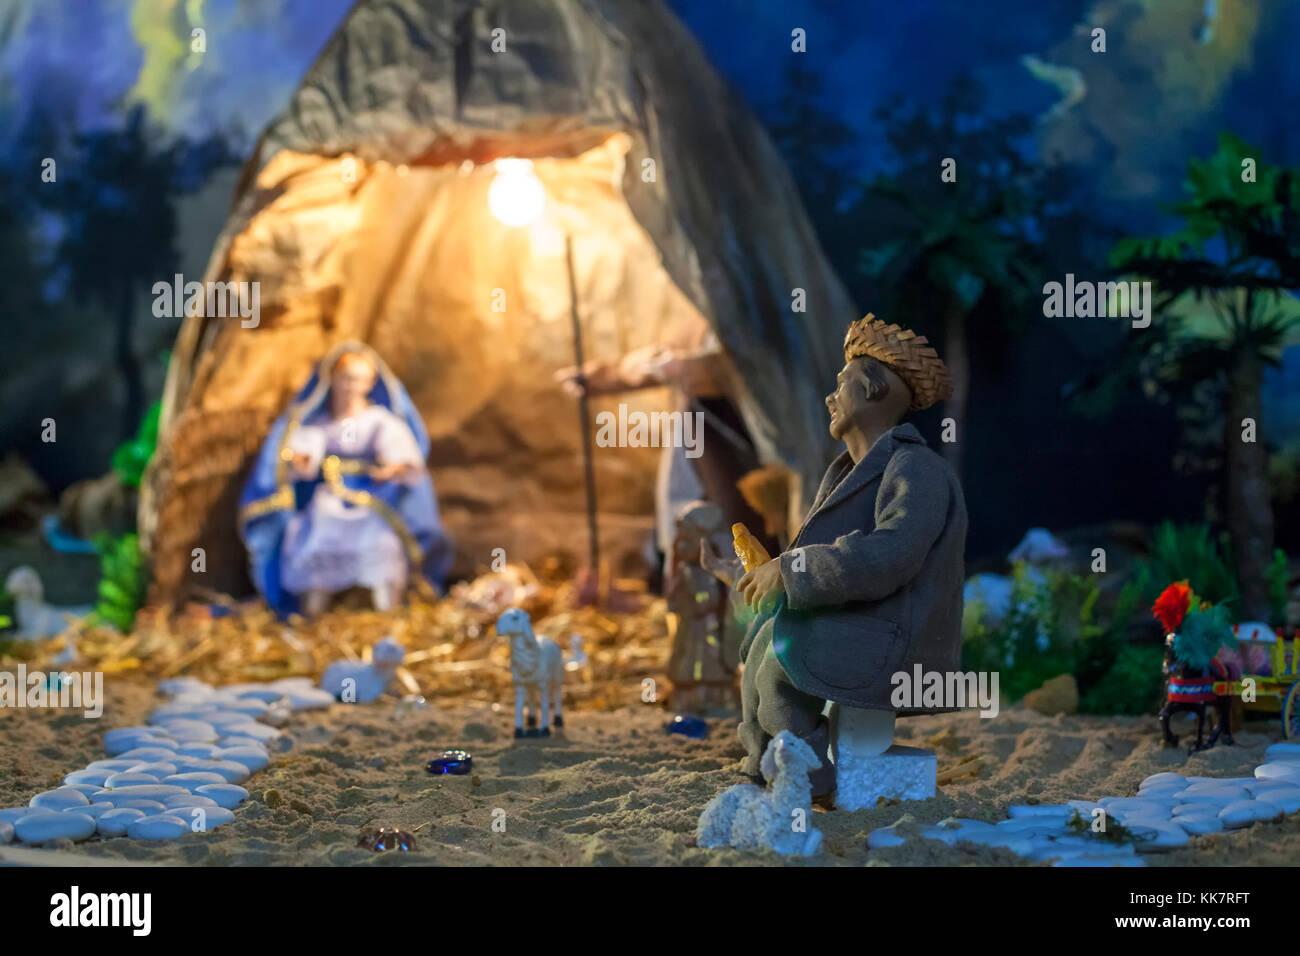 brazilian christmas manger scene with figurines including jesus mary joseph sheep and magi